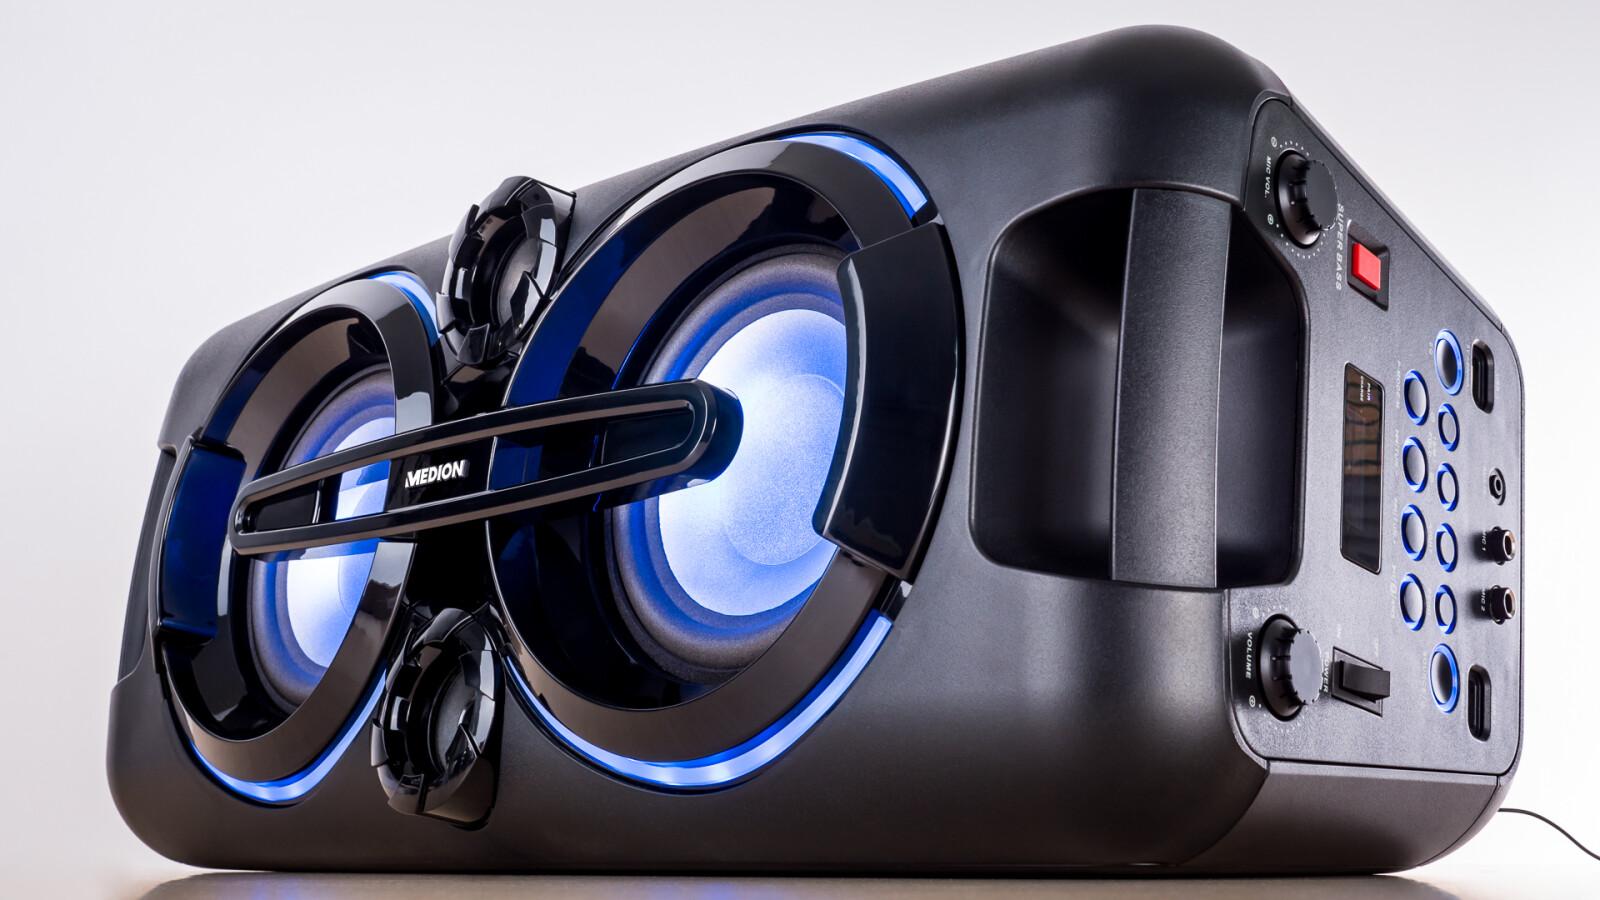 medion p67013 bei aldi bluetooth box f r 90 euro im test. Black Bedroom Furniture Sets. Home Design Ideas